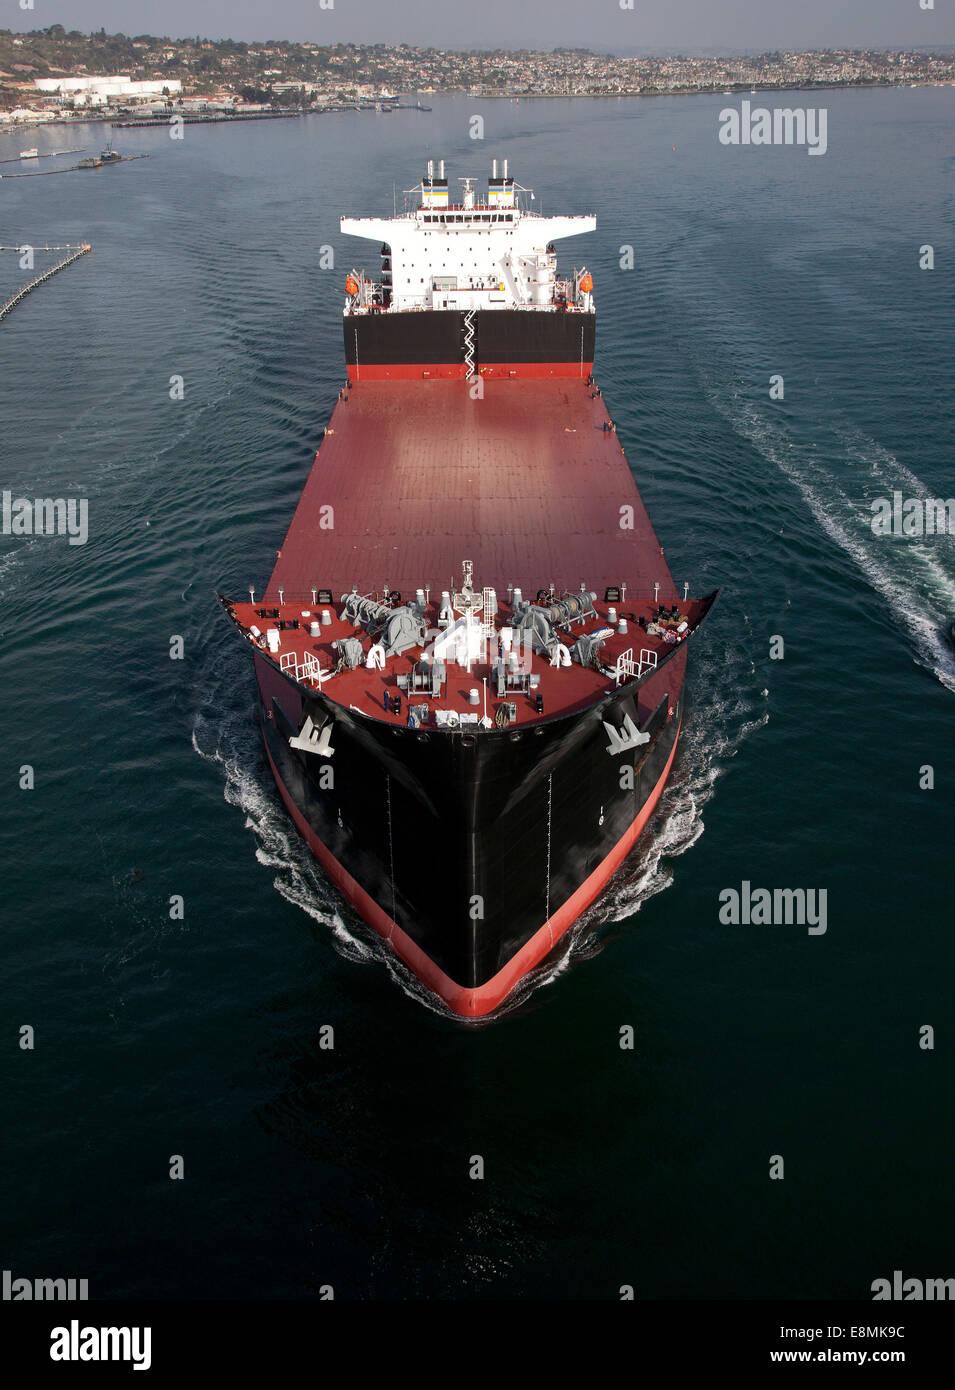 San Diego, January 9, 2014 - The Military Sealift Command mobile landing ship USNS John Glenn (MLP 2) underway off - Stock Image